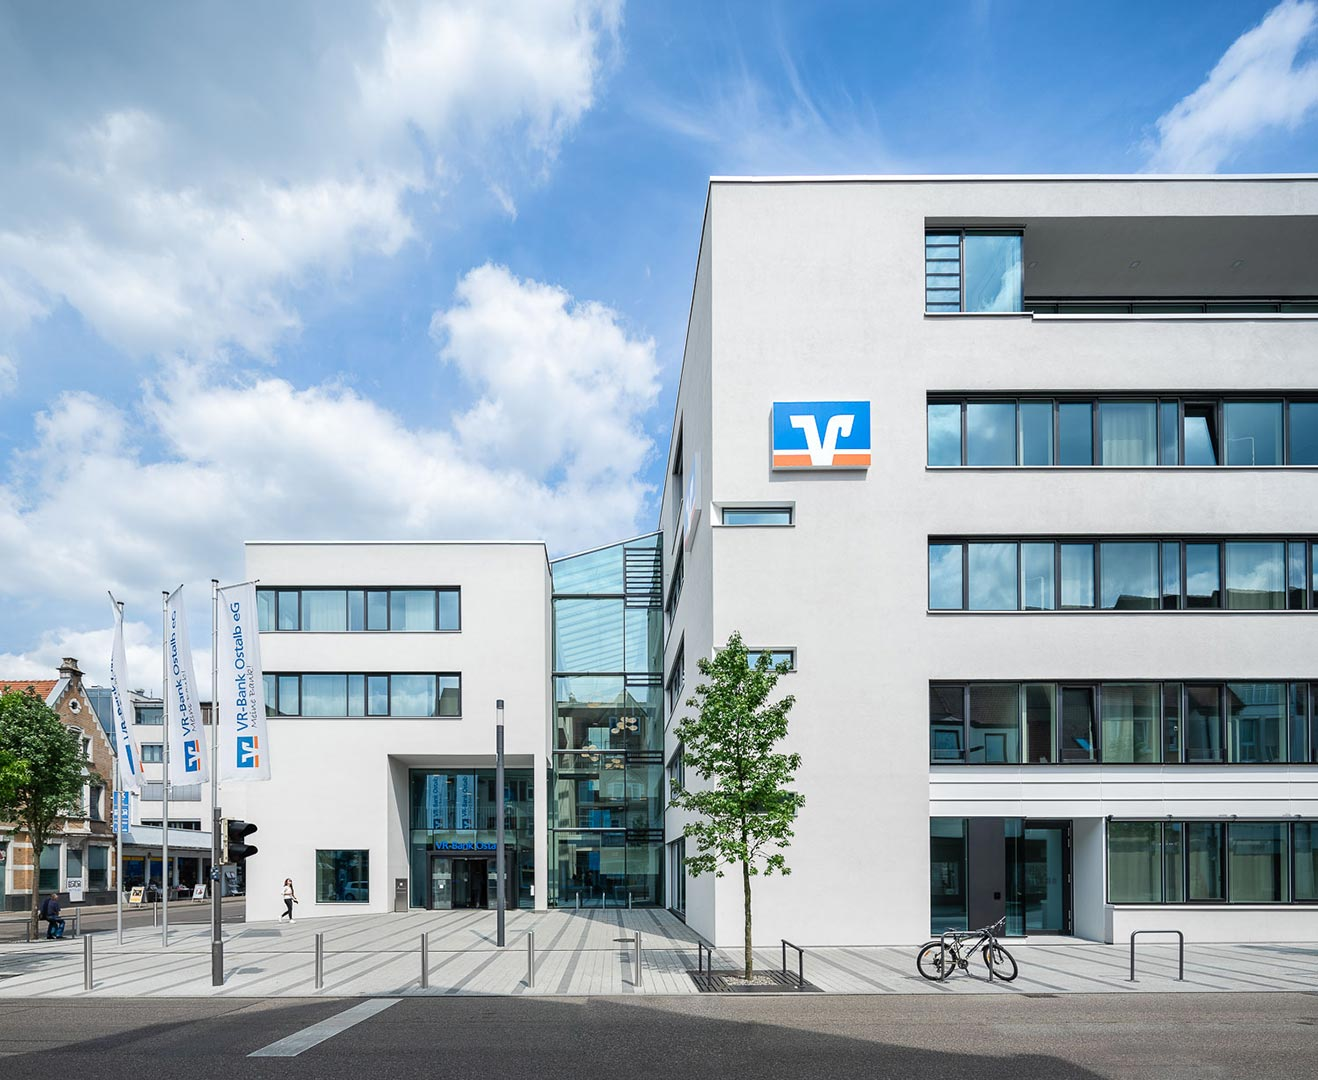 VR-Bank Ostalb, Aalen – OHO-Architekten Stuttgart